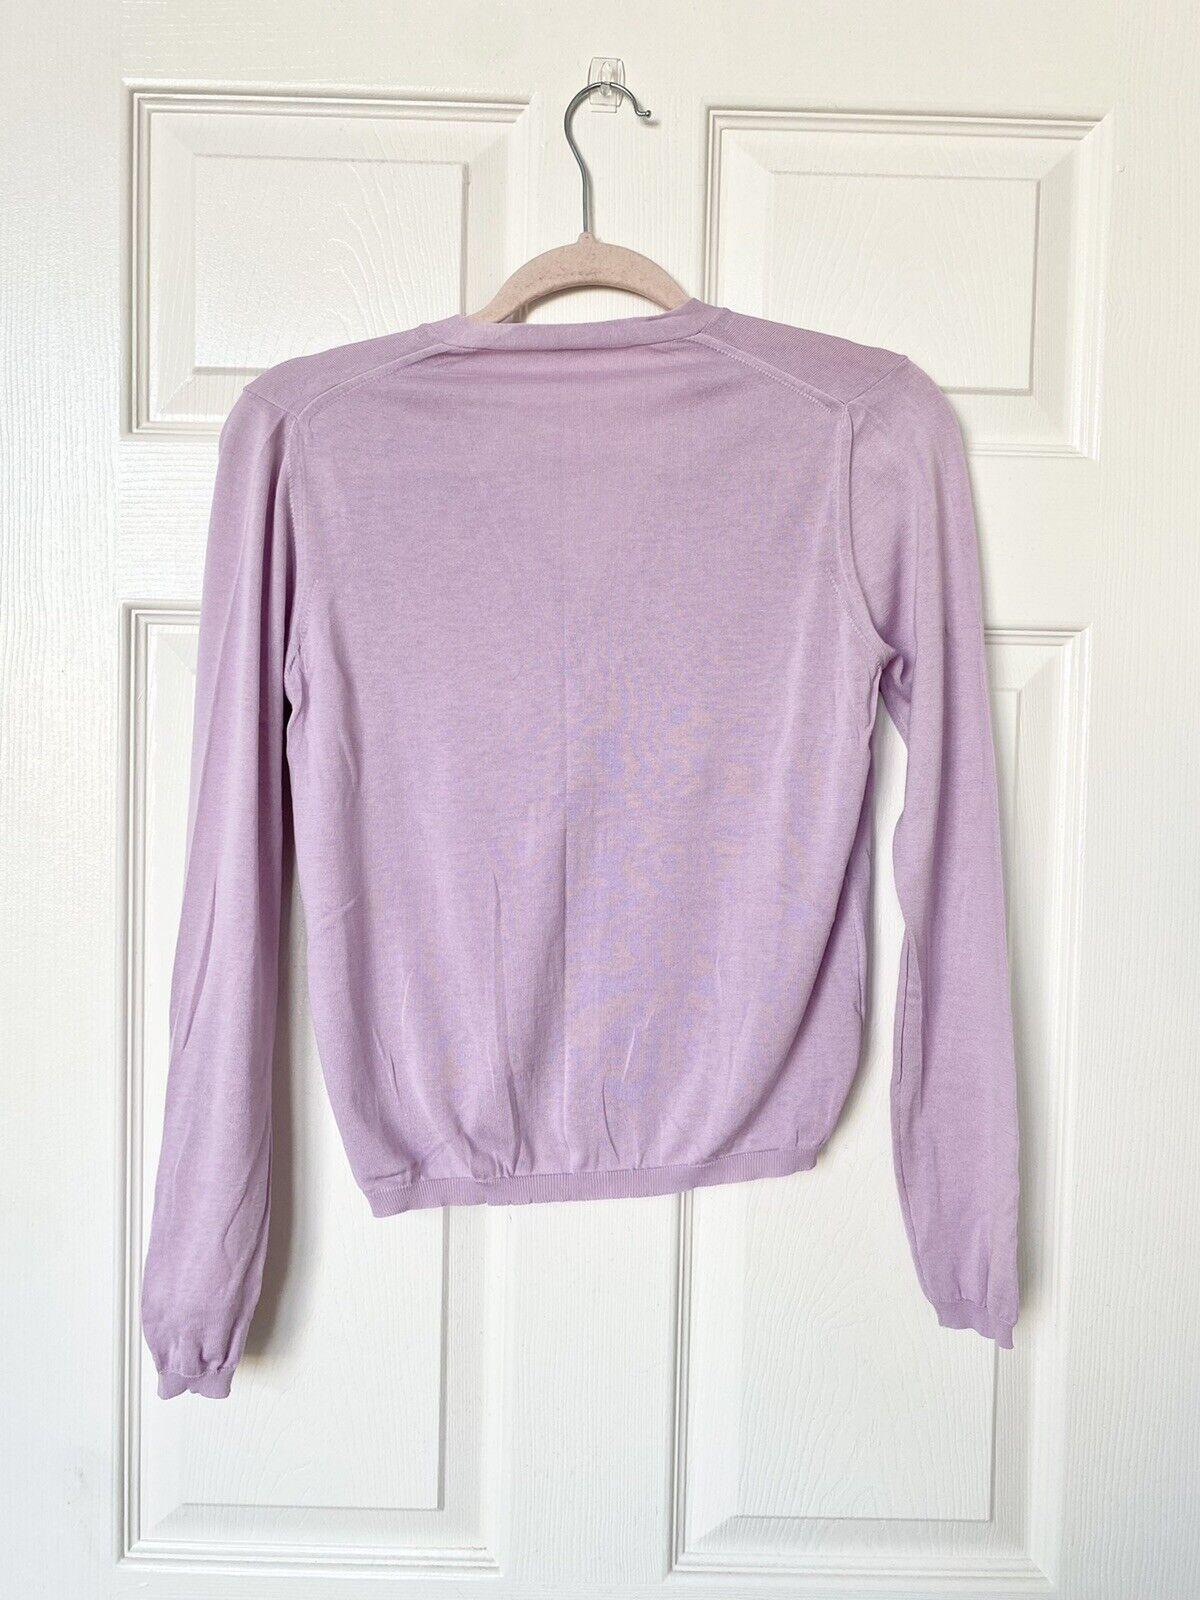 Malo Lilac Lightweight Cardigan Size 42 IT / US 6 - image 3